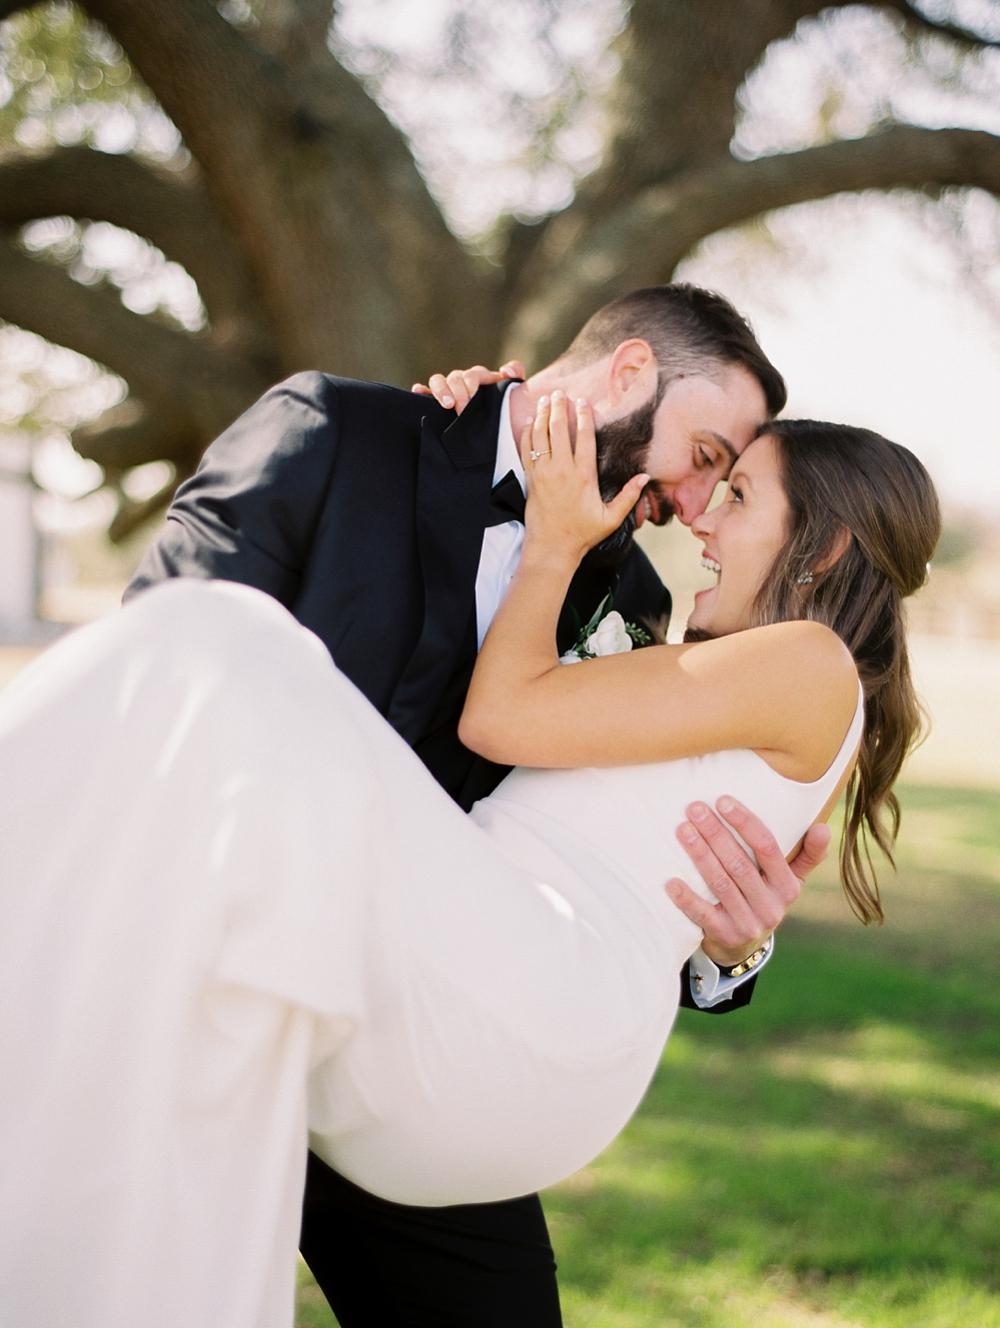 Kristin-La-Voie-Photography-austin-houston-texas-wedding-photographer-the-oaks-at-high-hill -51